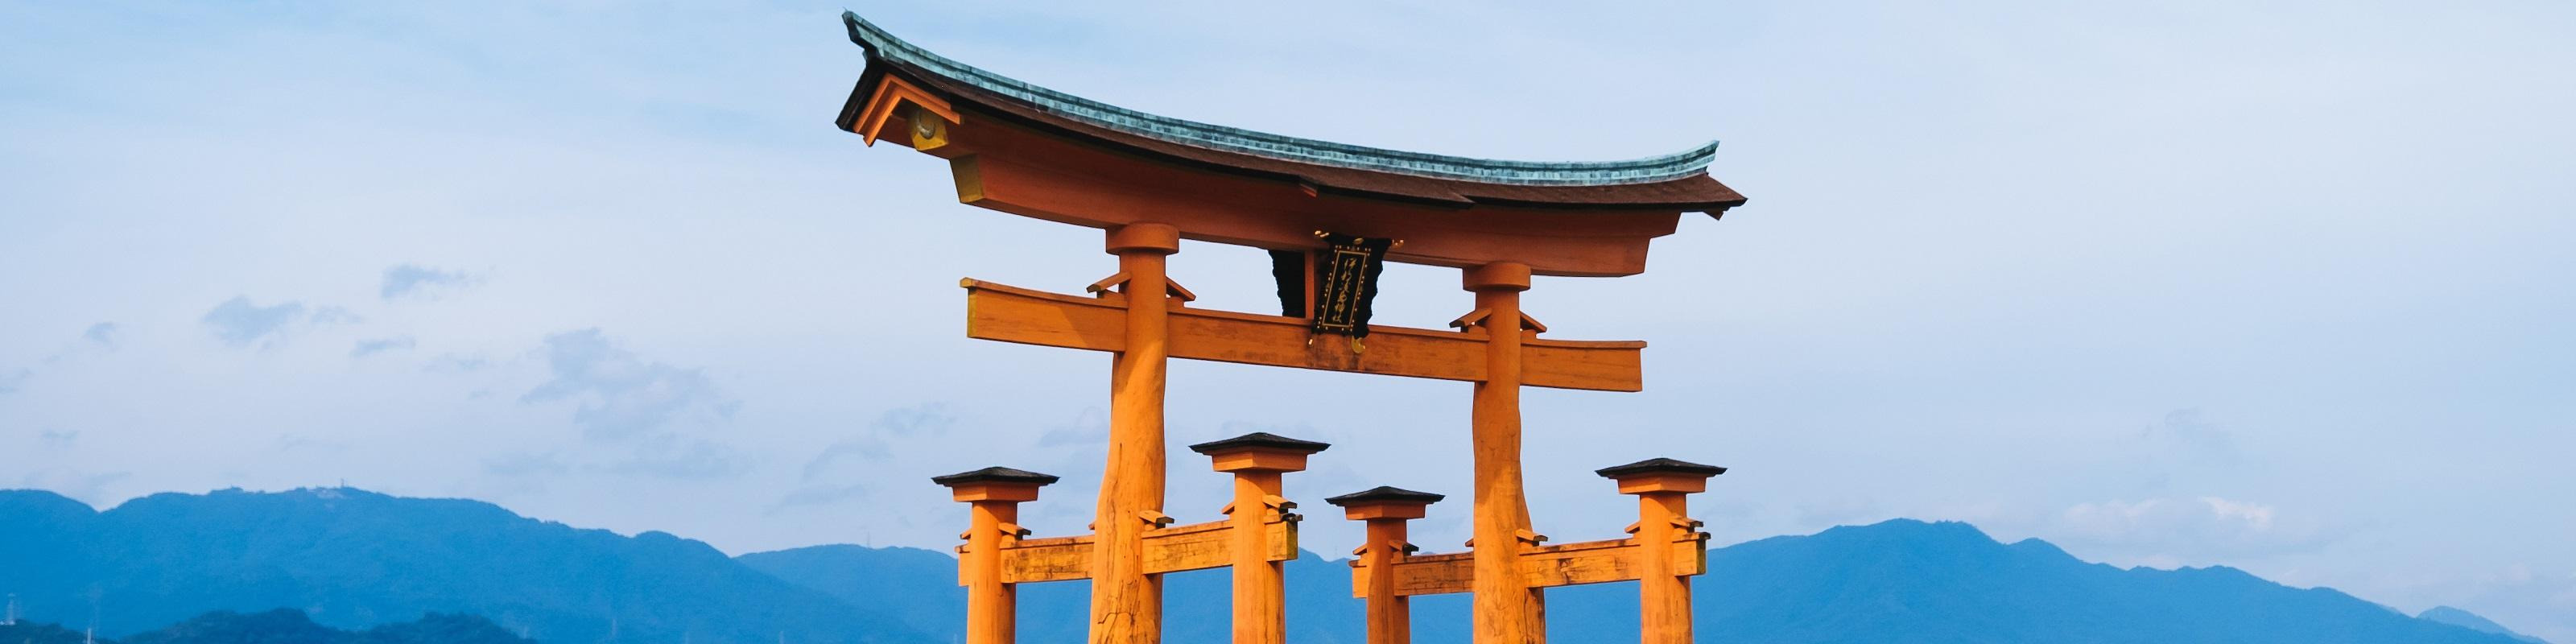 Itsukishima Shrine on Miyajima Island in Hiroshima, Japan